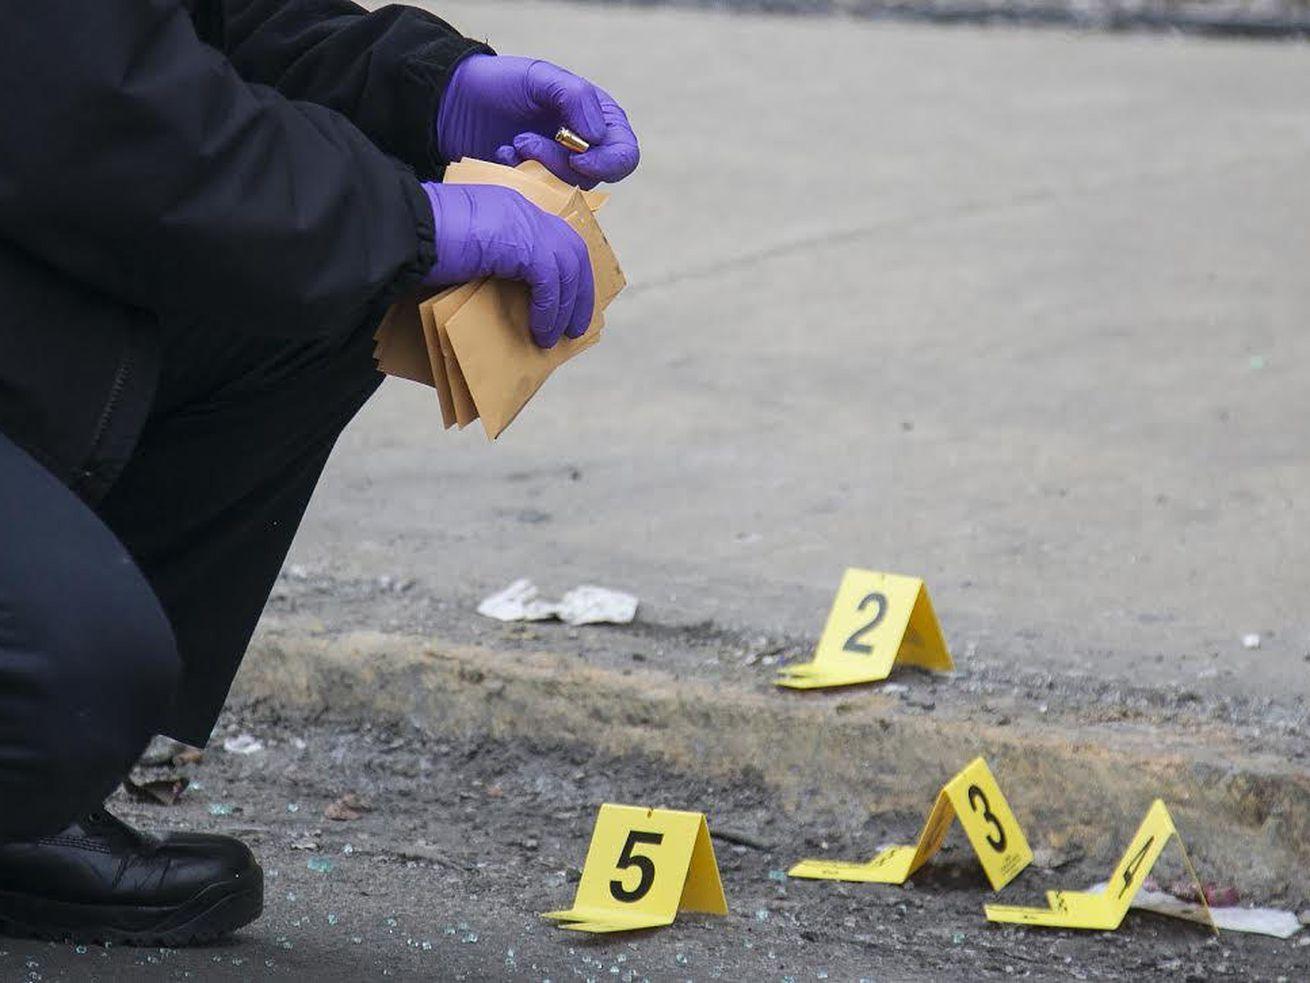 A four-year-old boy was shot March 19, 2021, in Washington Park.